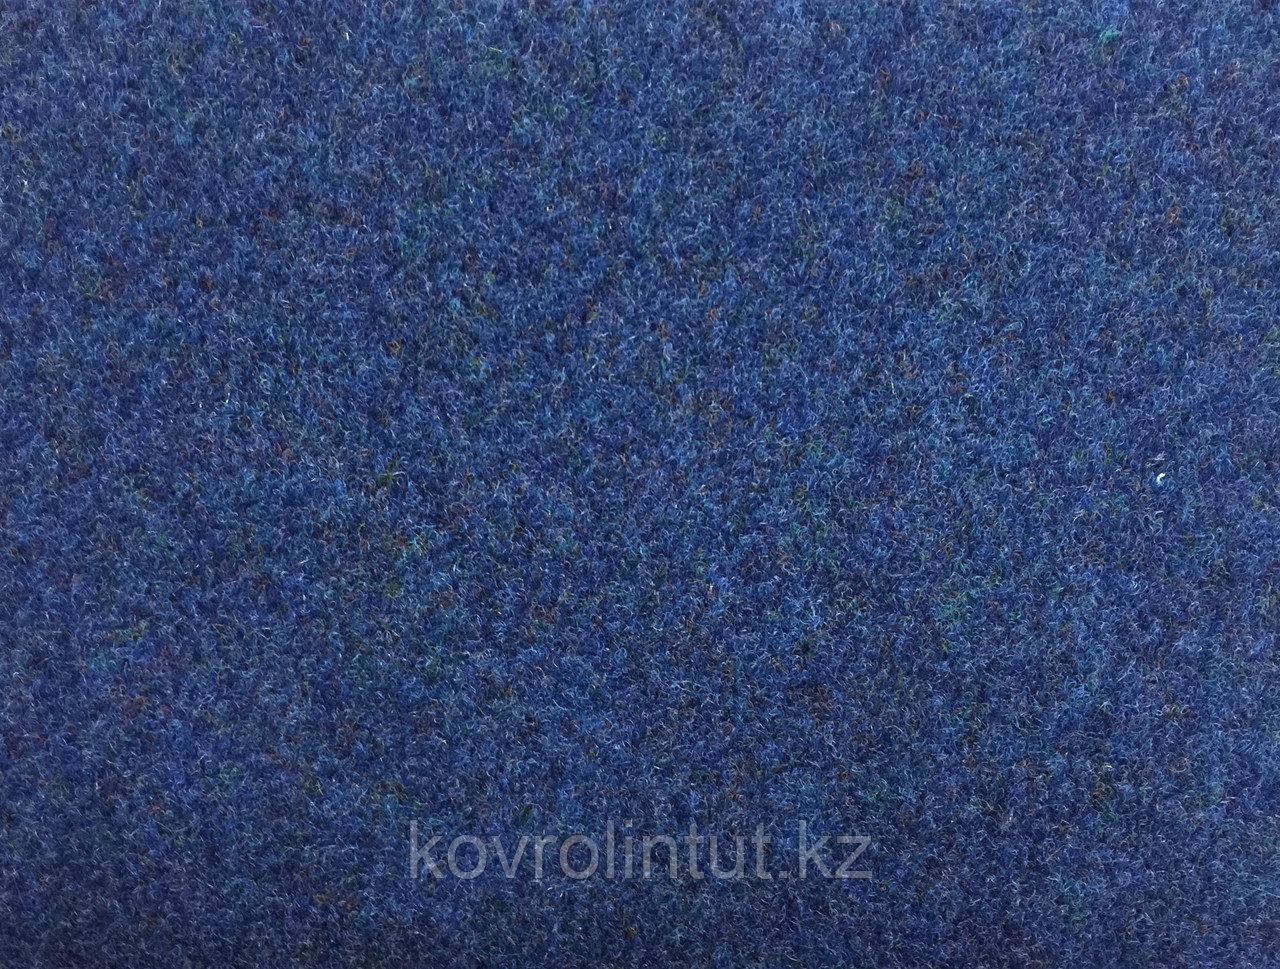 Ковролин Примавера 5516, синий/резина 4 м, опт/розн